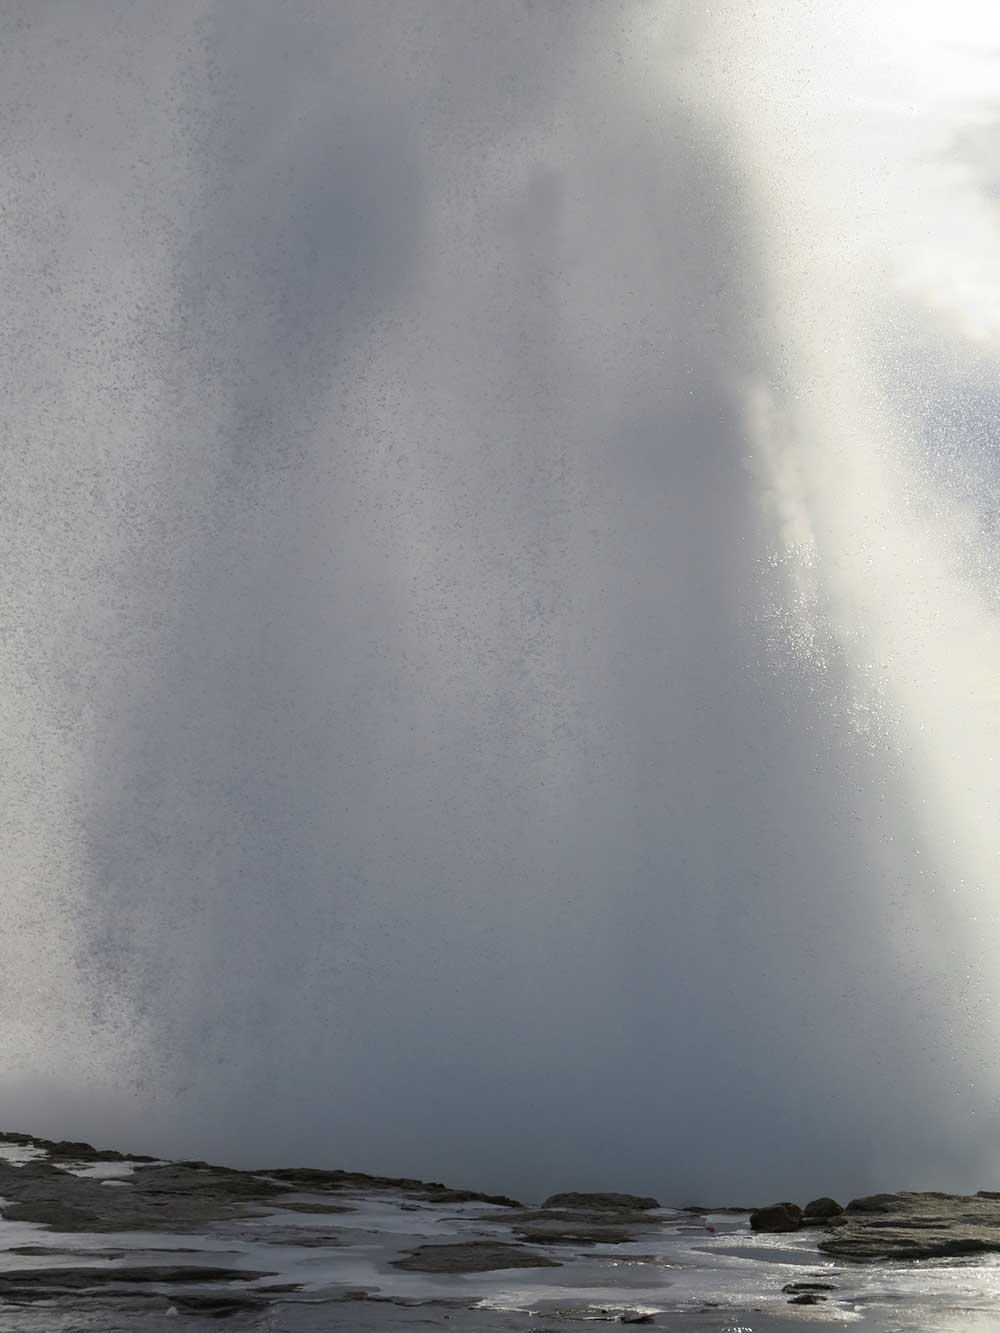 Columna de agua hirviendo